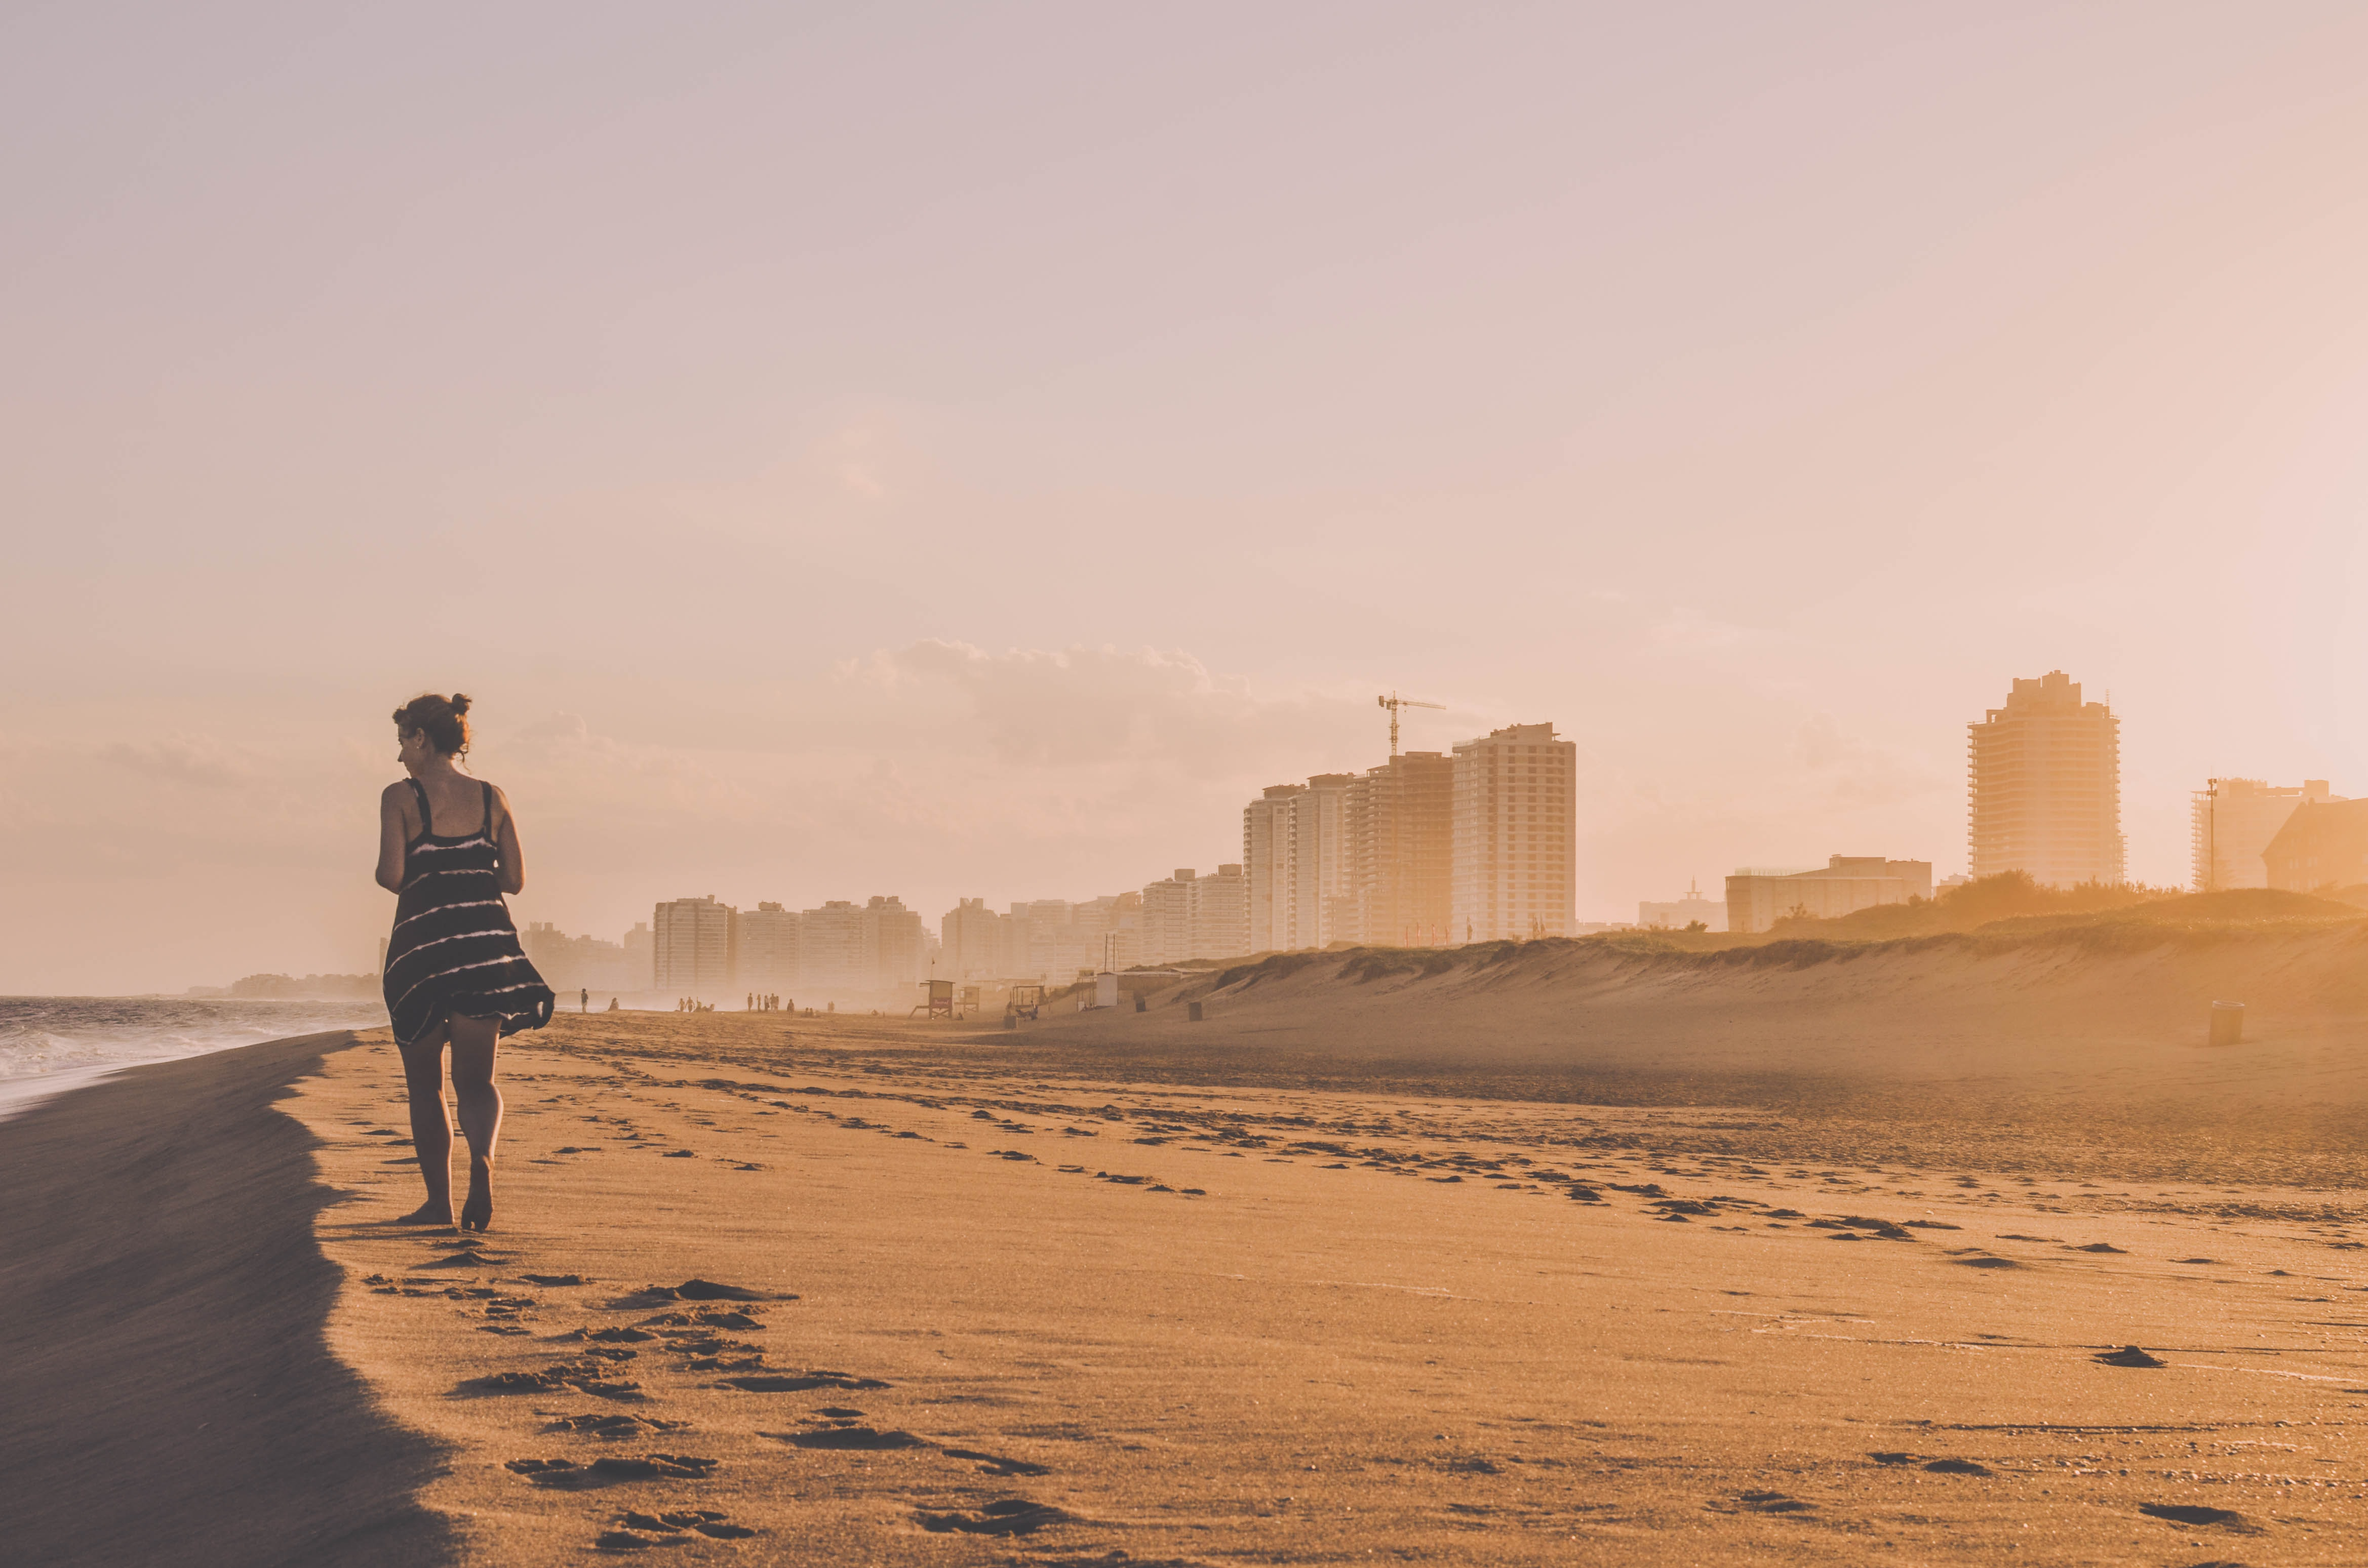 woman walking on desert sand